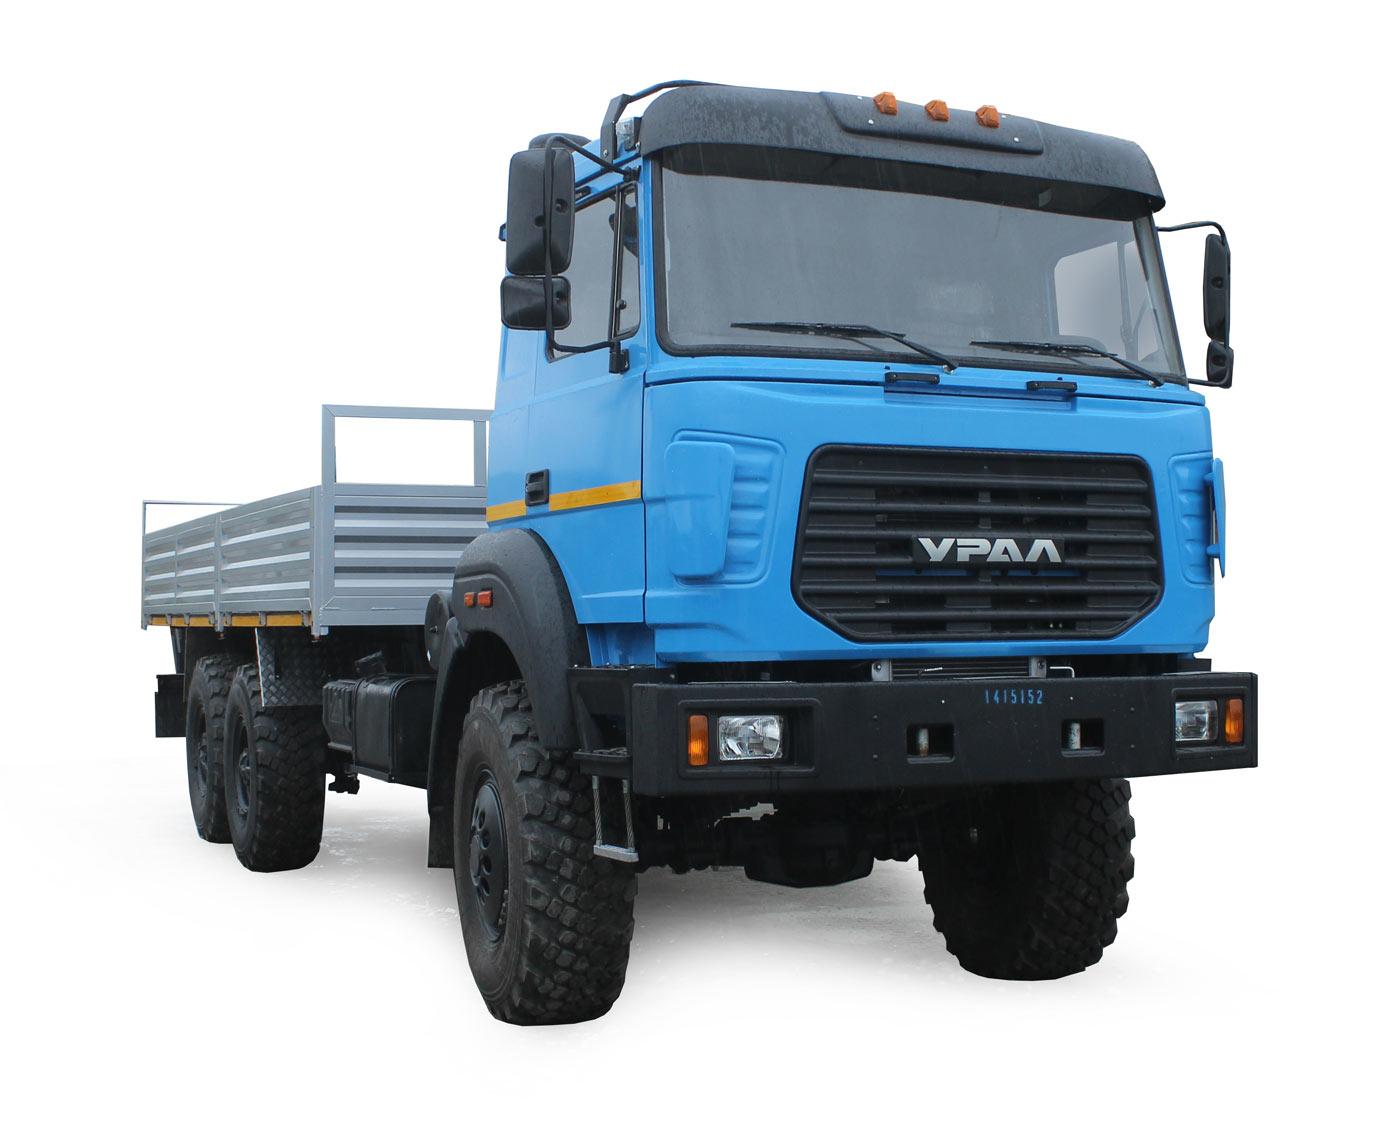 Ural M 4320 80 81 82 Commercial Vehicles Trucksplanet Engine Diagram